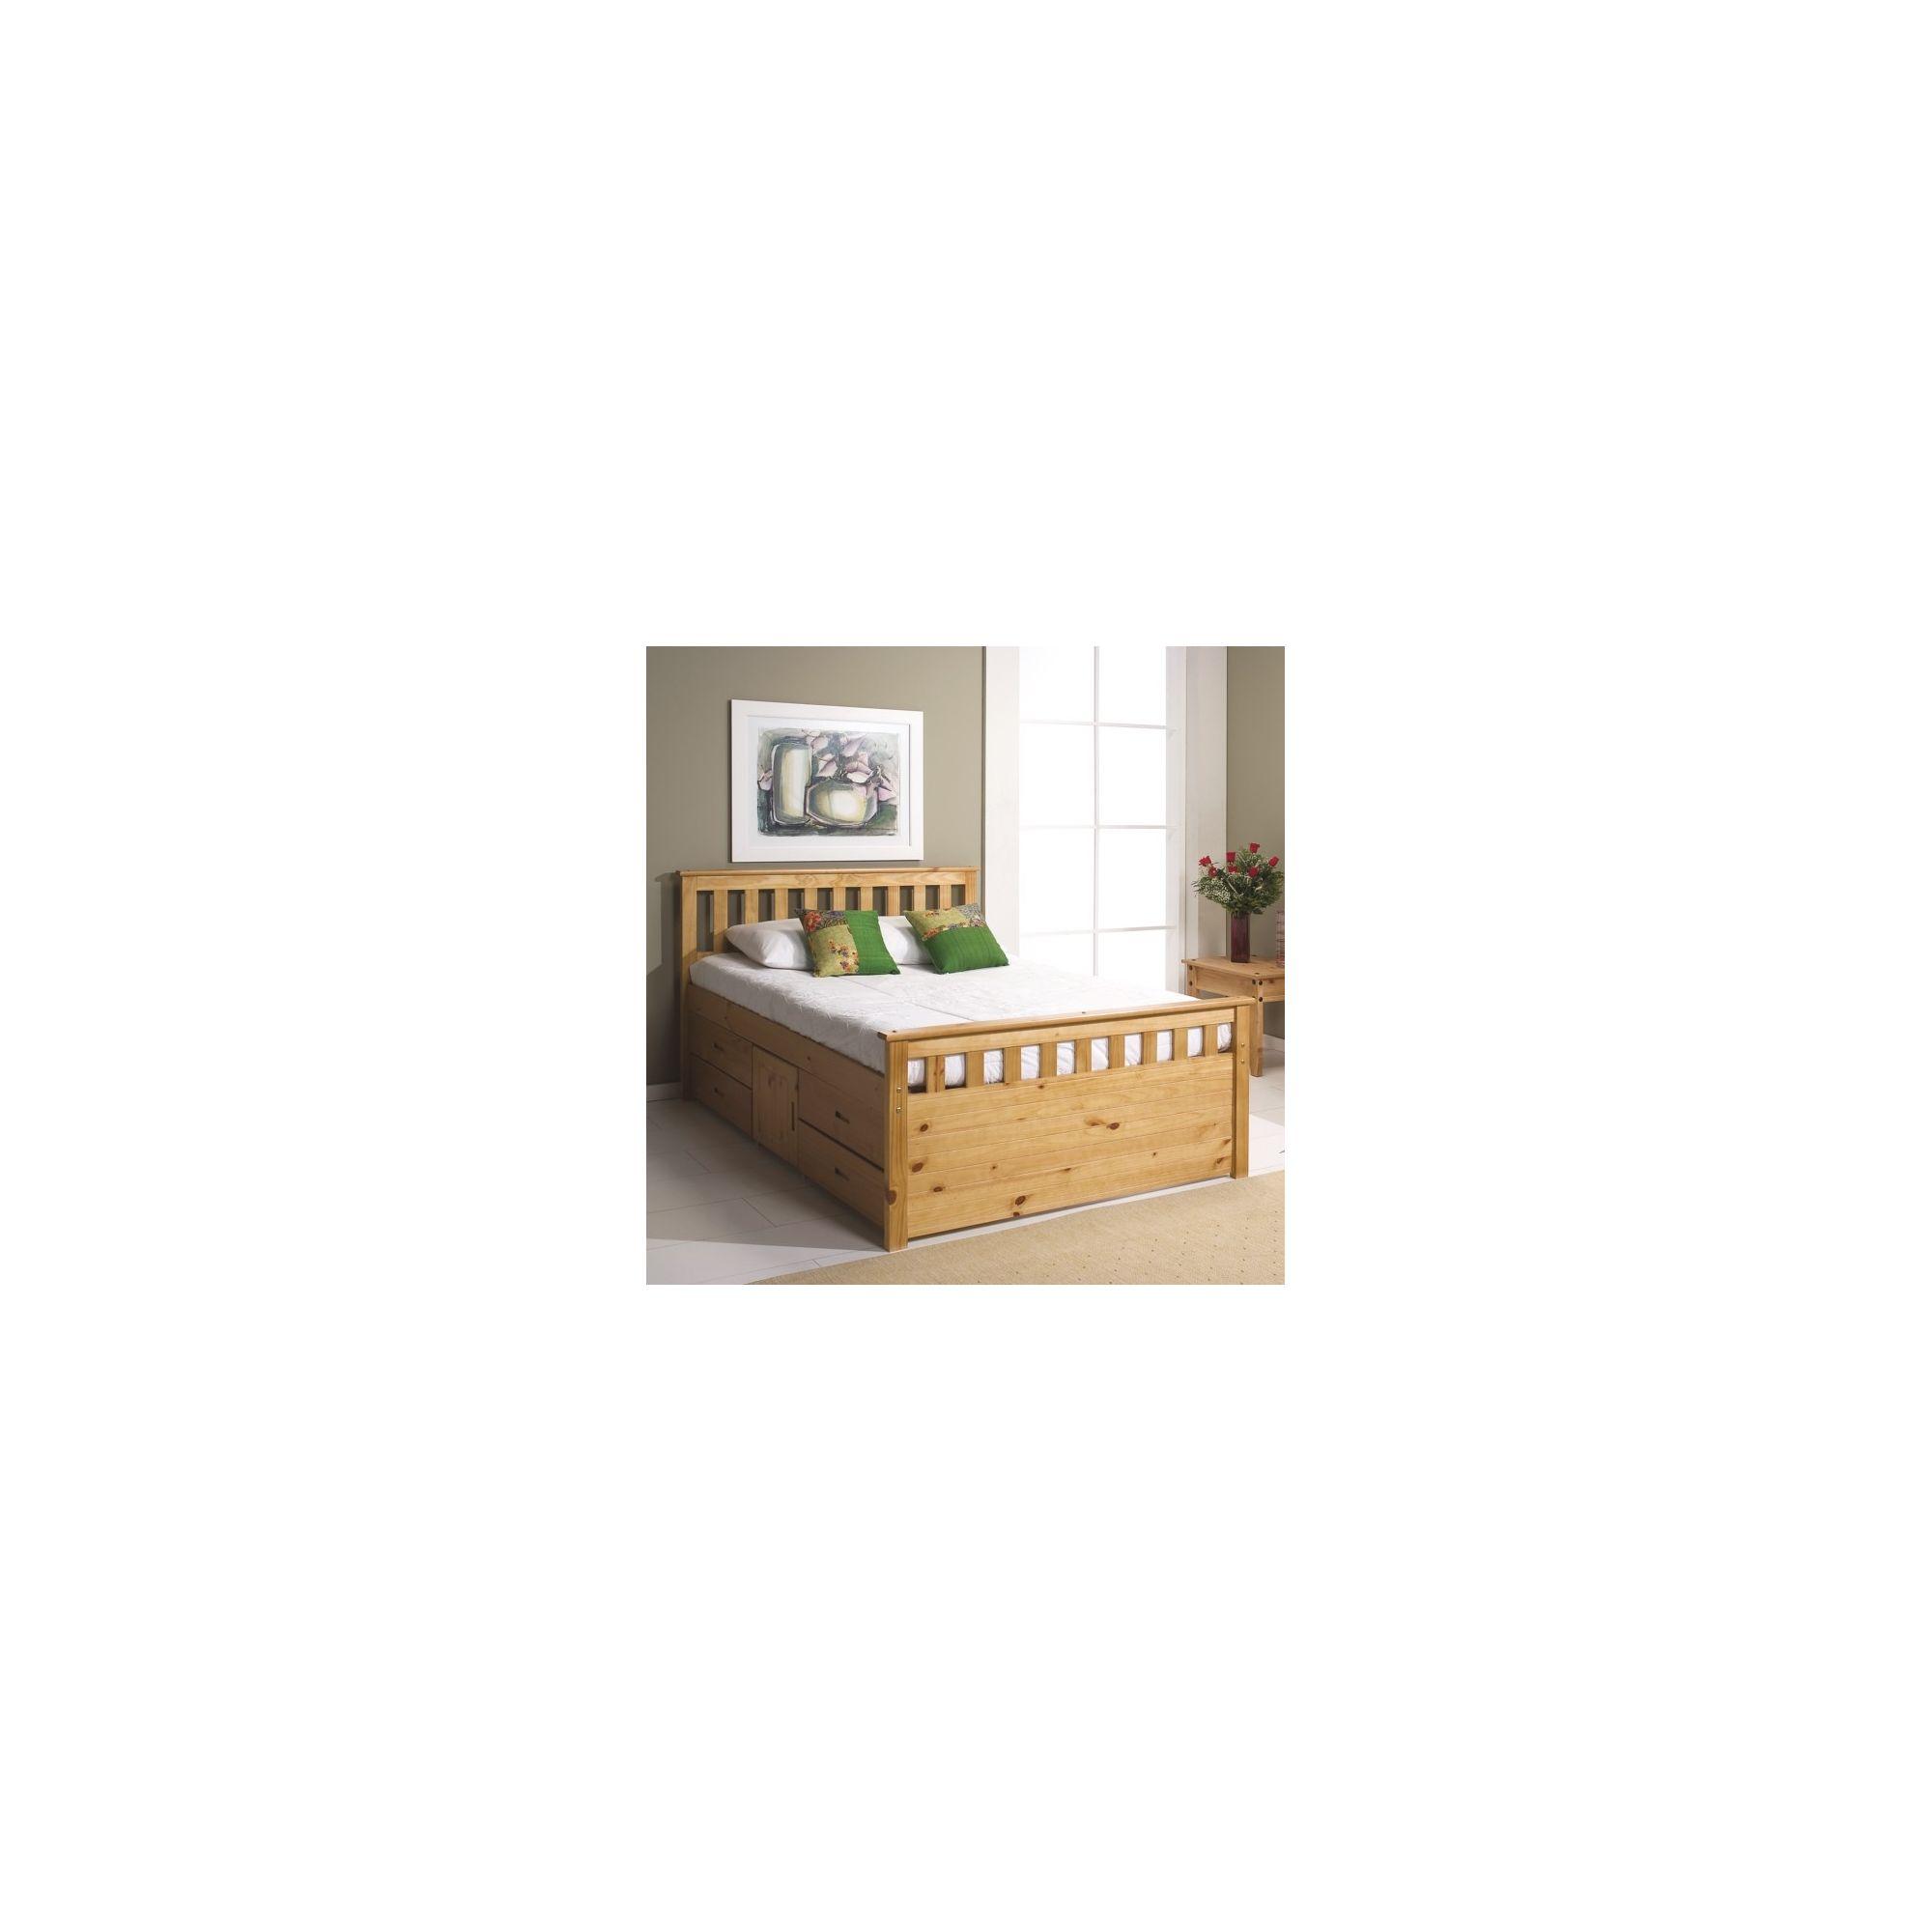 Verona Ferrara Captains Bed - Double - One Side - Antique at Tesco Direct